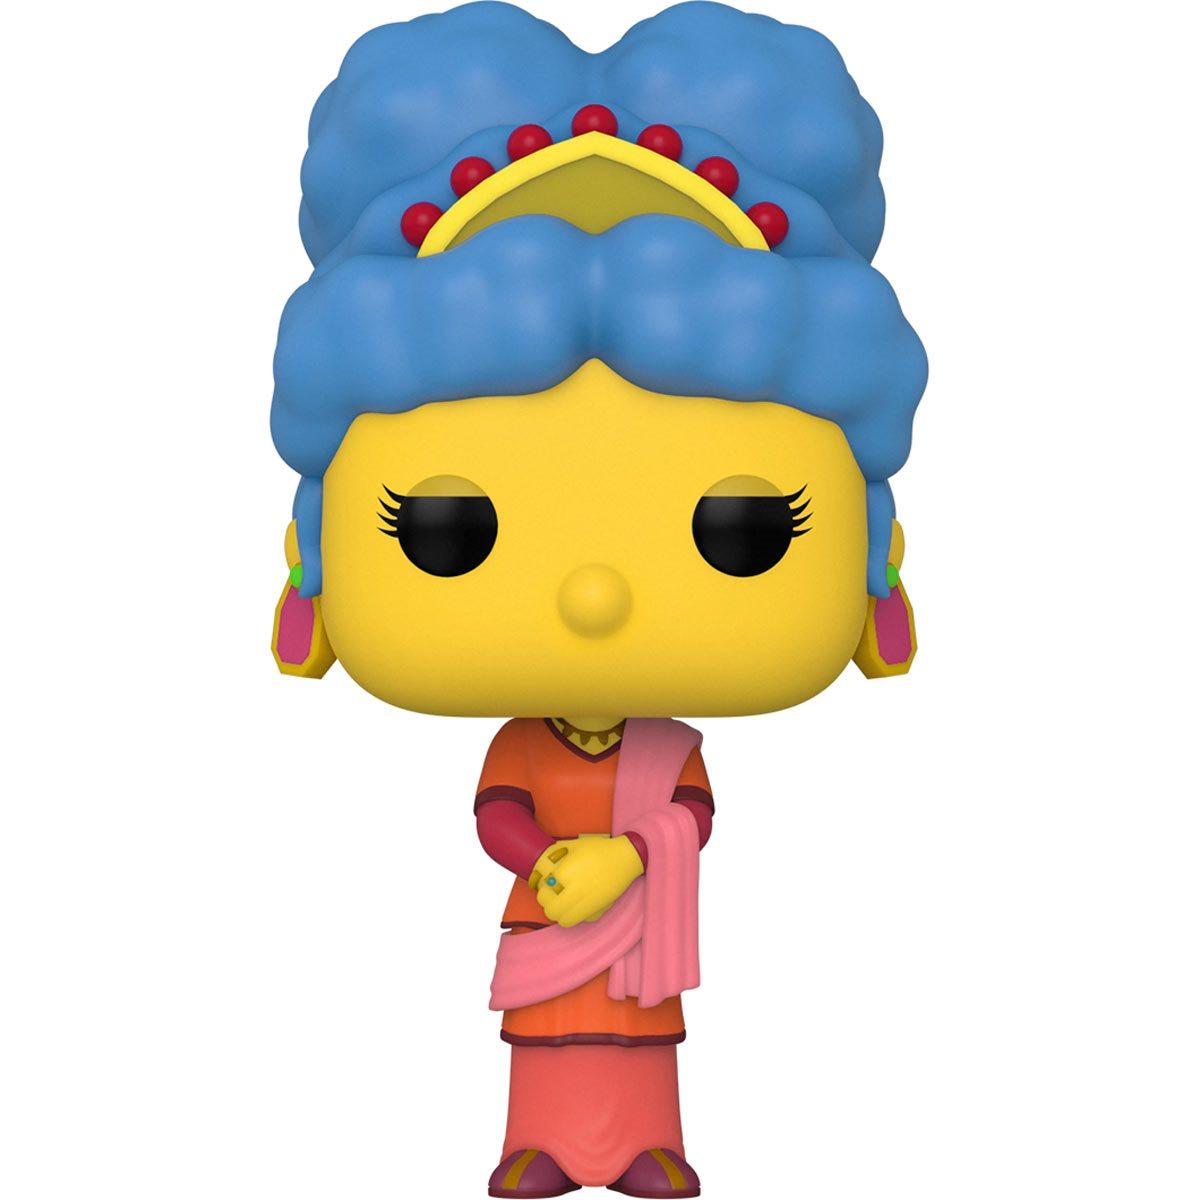 PRÉ VENDA: Funko Pop! Marjora Marge: Os Simpsons - Funko